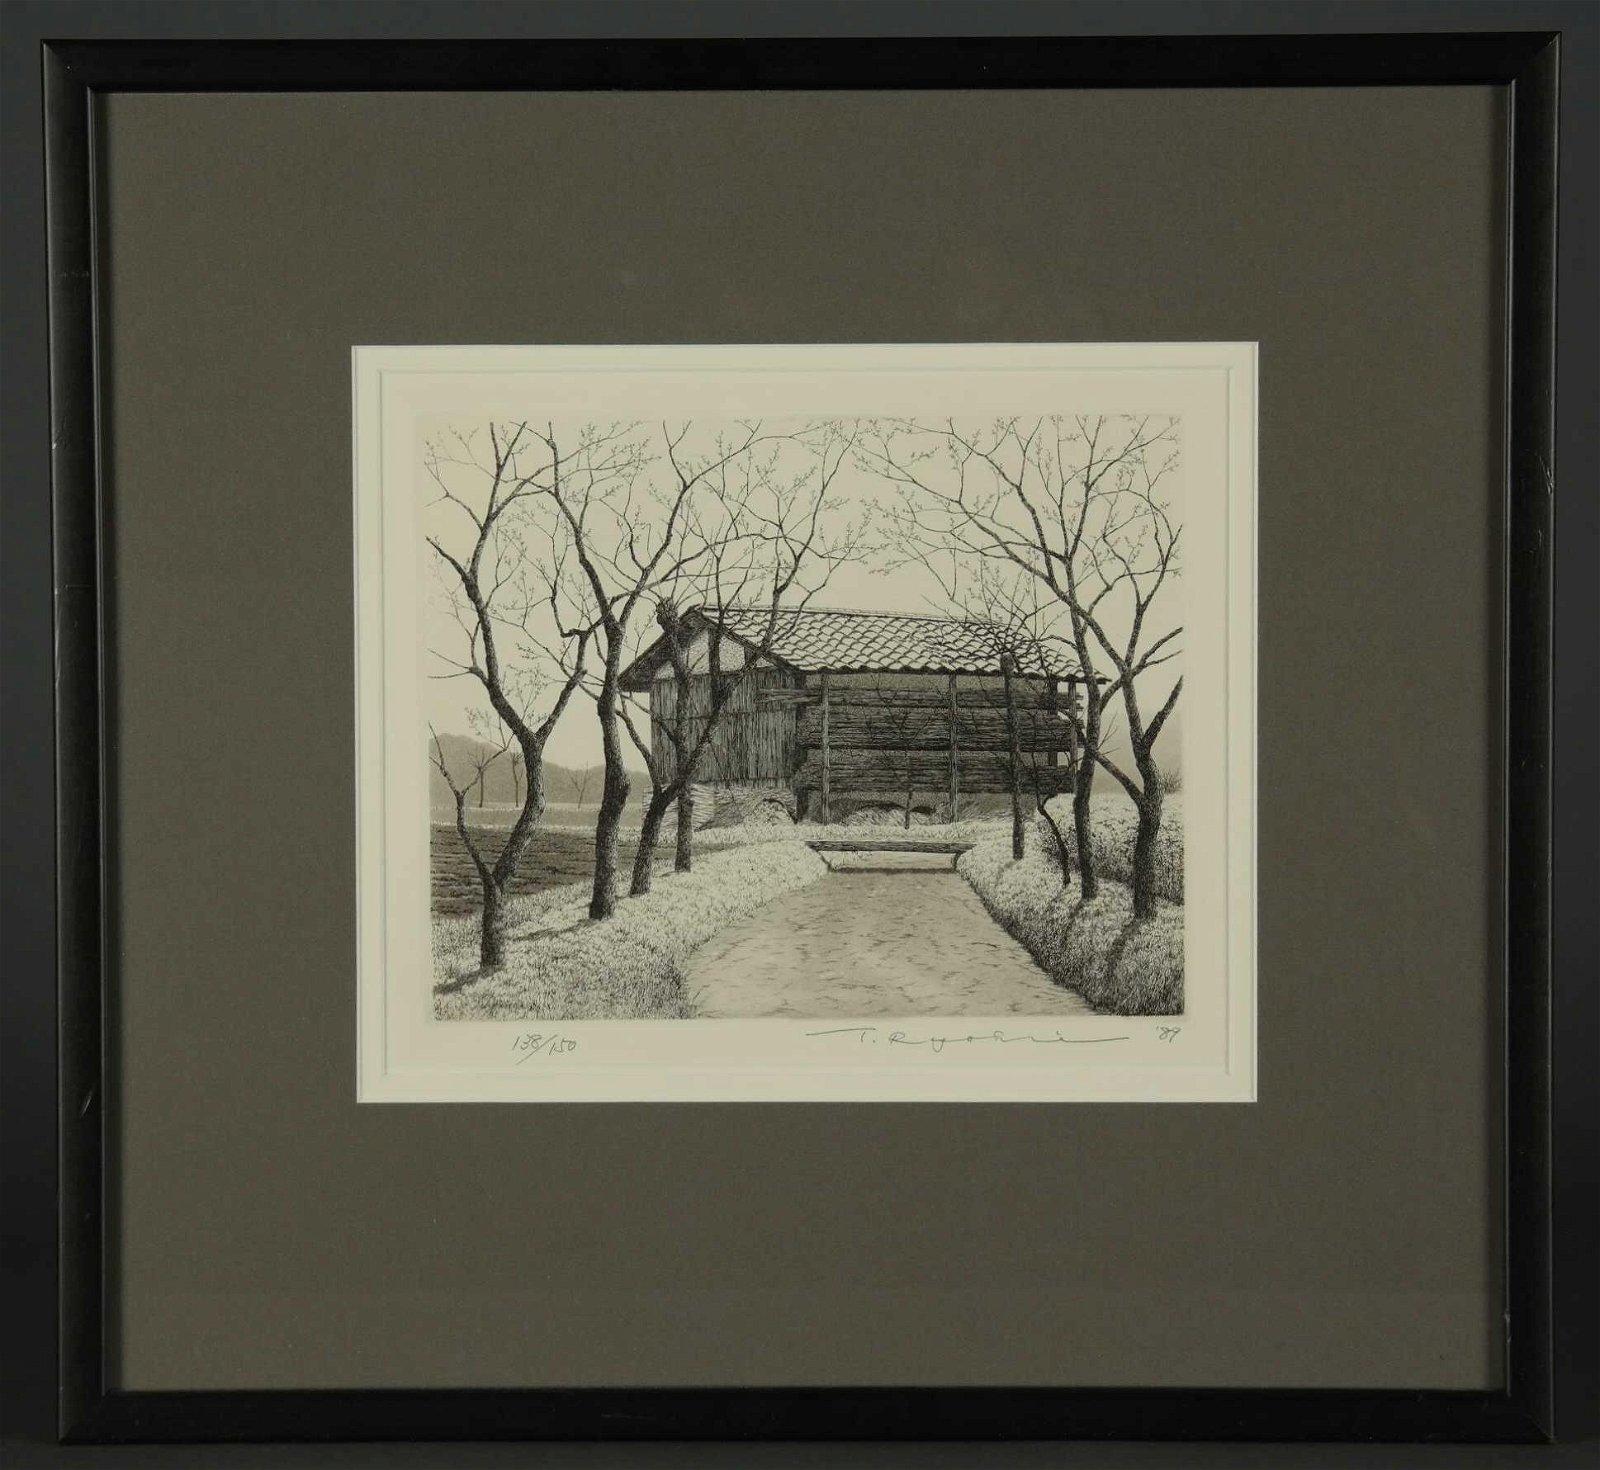 Ryohei Tanaka. 4 etchings. Roofs. 1980s/90s.